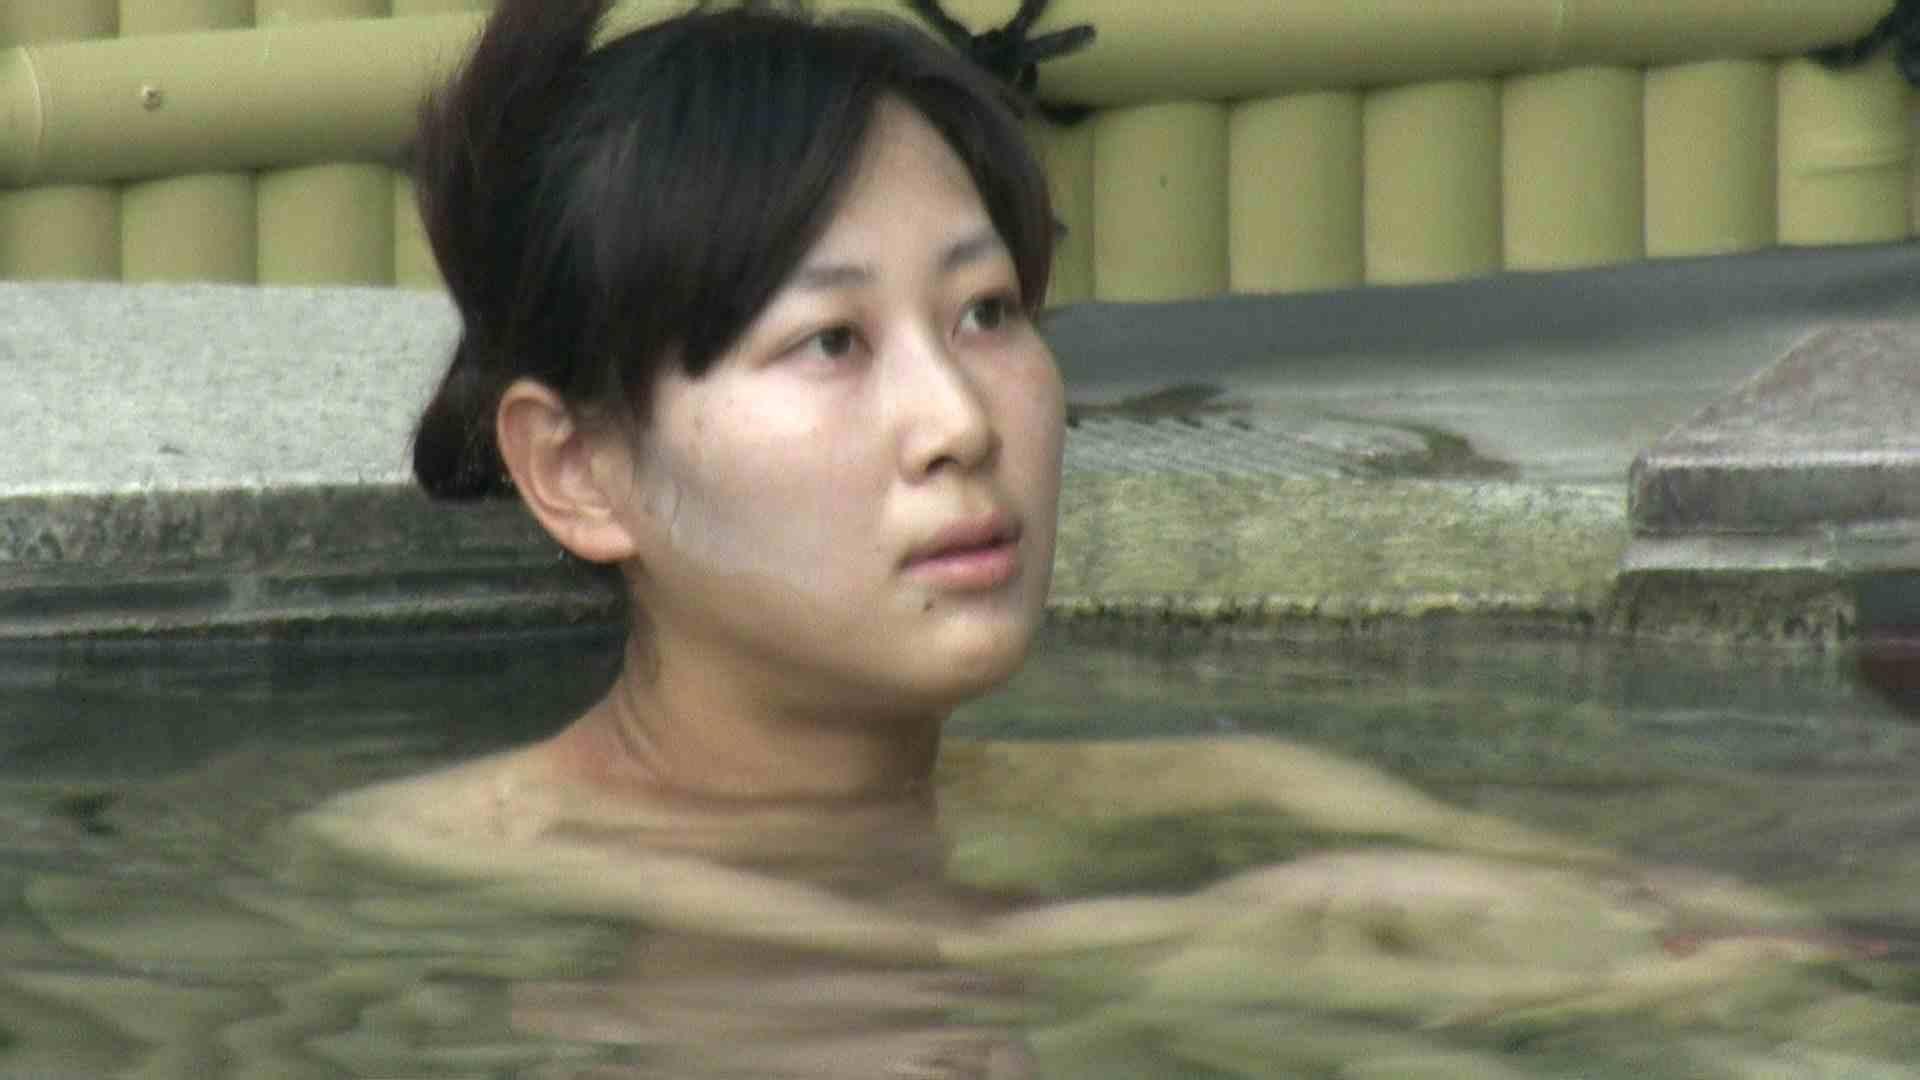 Aquaな露天風呂Vol.665 露天風呂編  86PIX 36